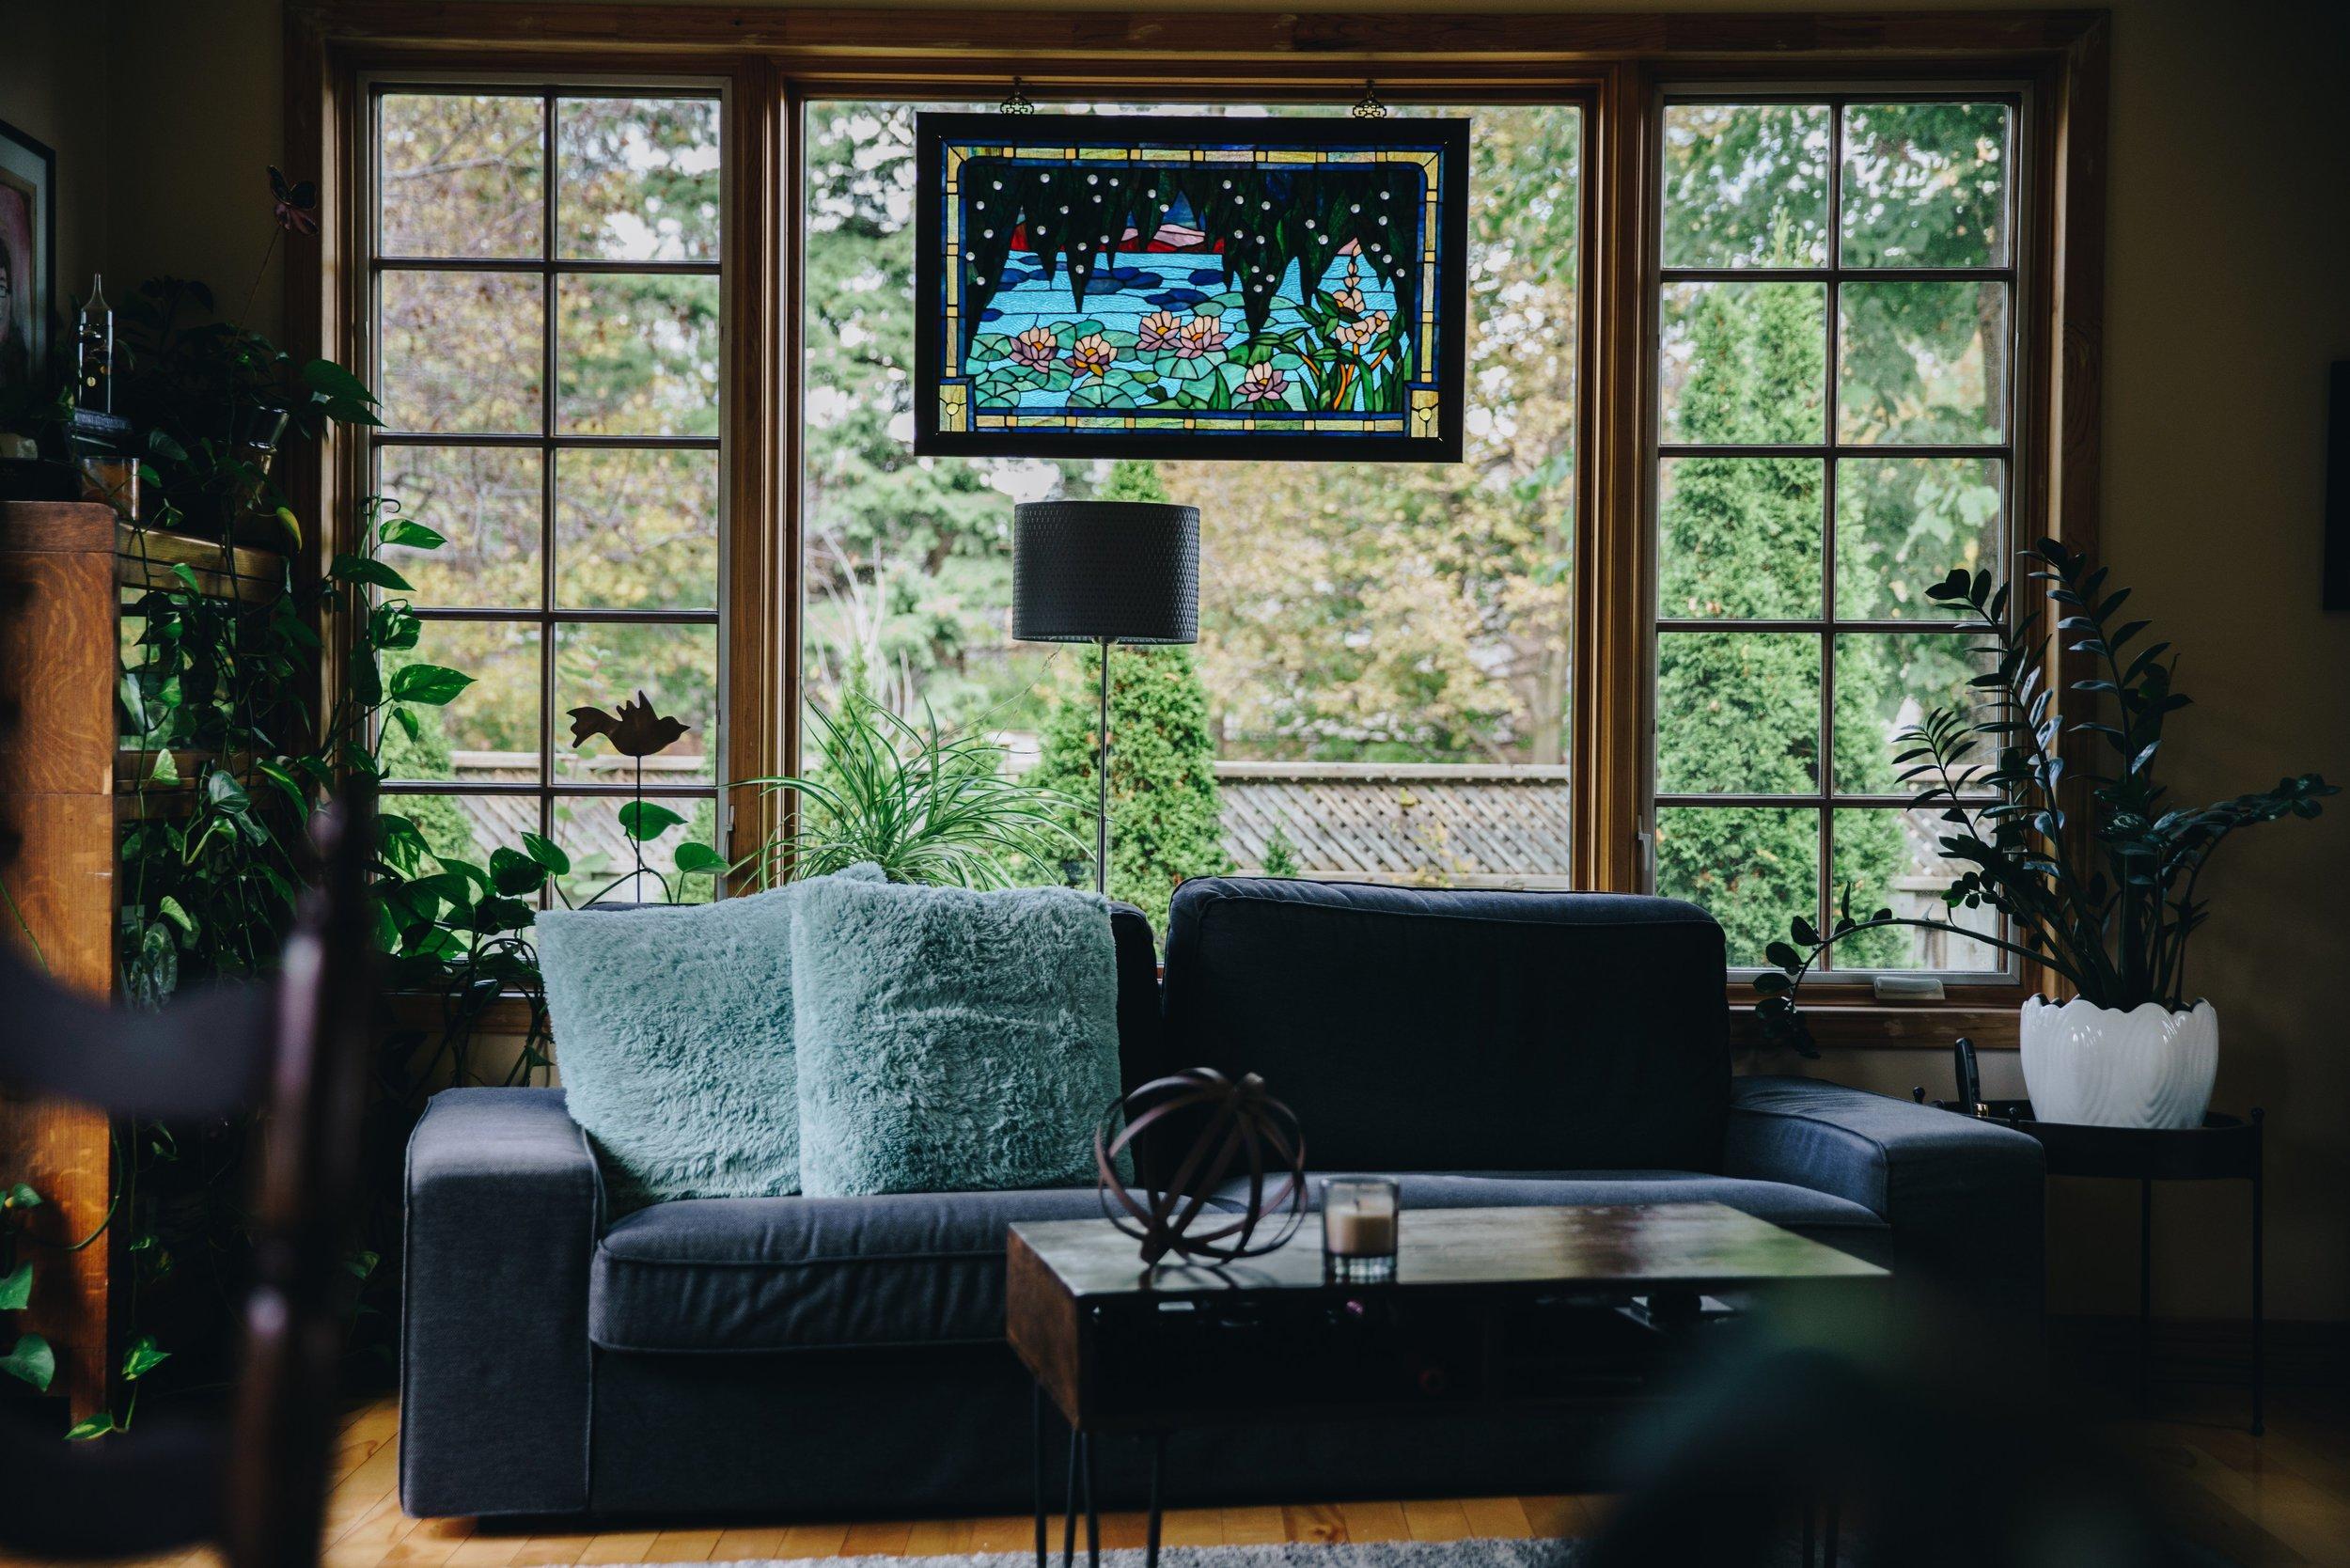 cozy-livingroom-with-window_4460x4460.jpg